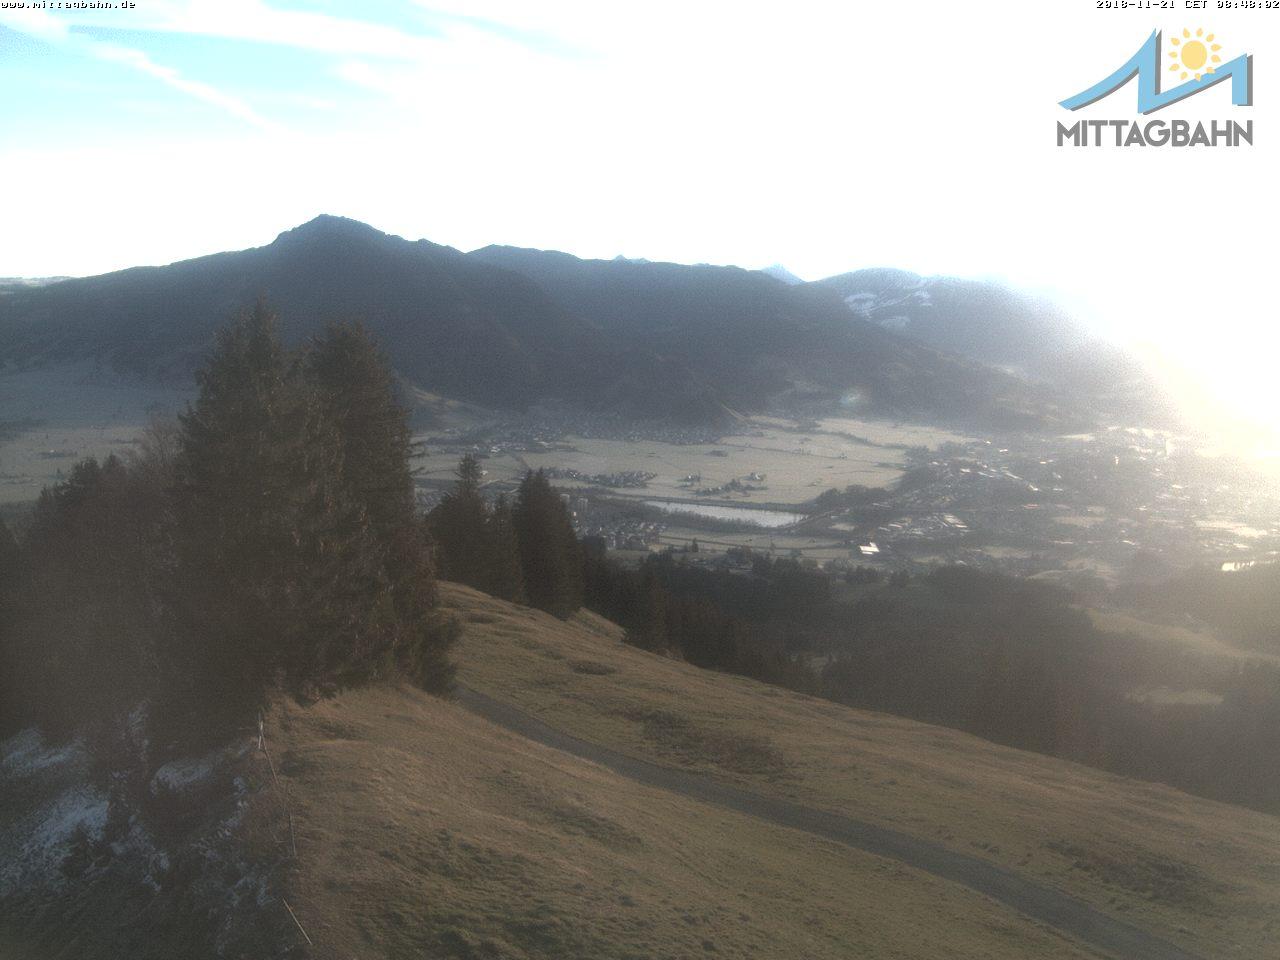 Webcam Skigebied Immenstadt - Mittag cam 7 - Allgäuer Alpen